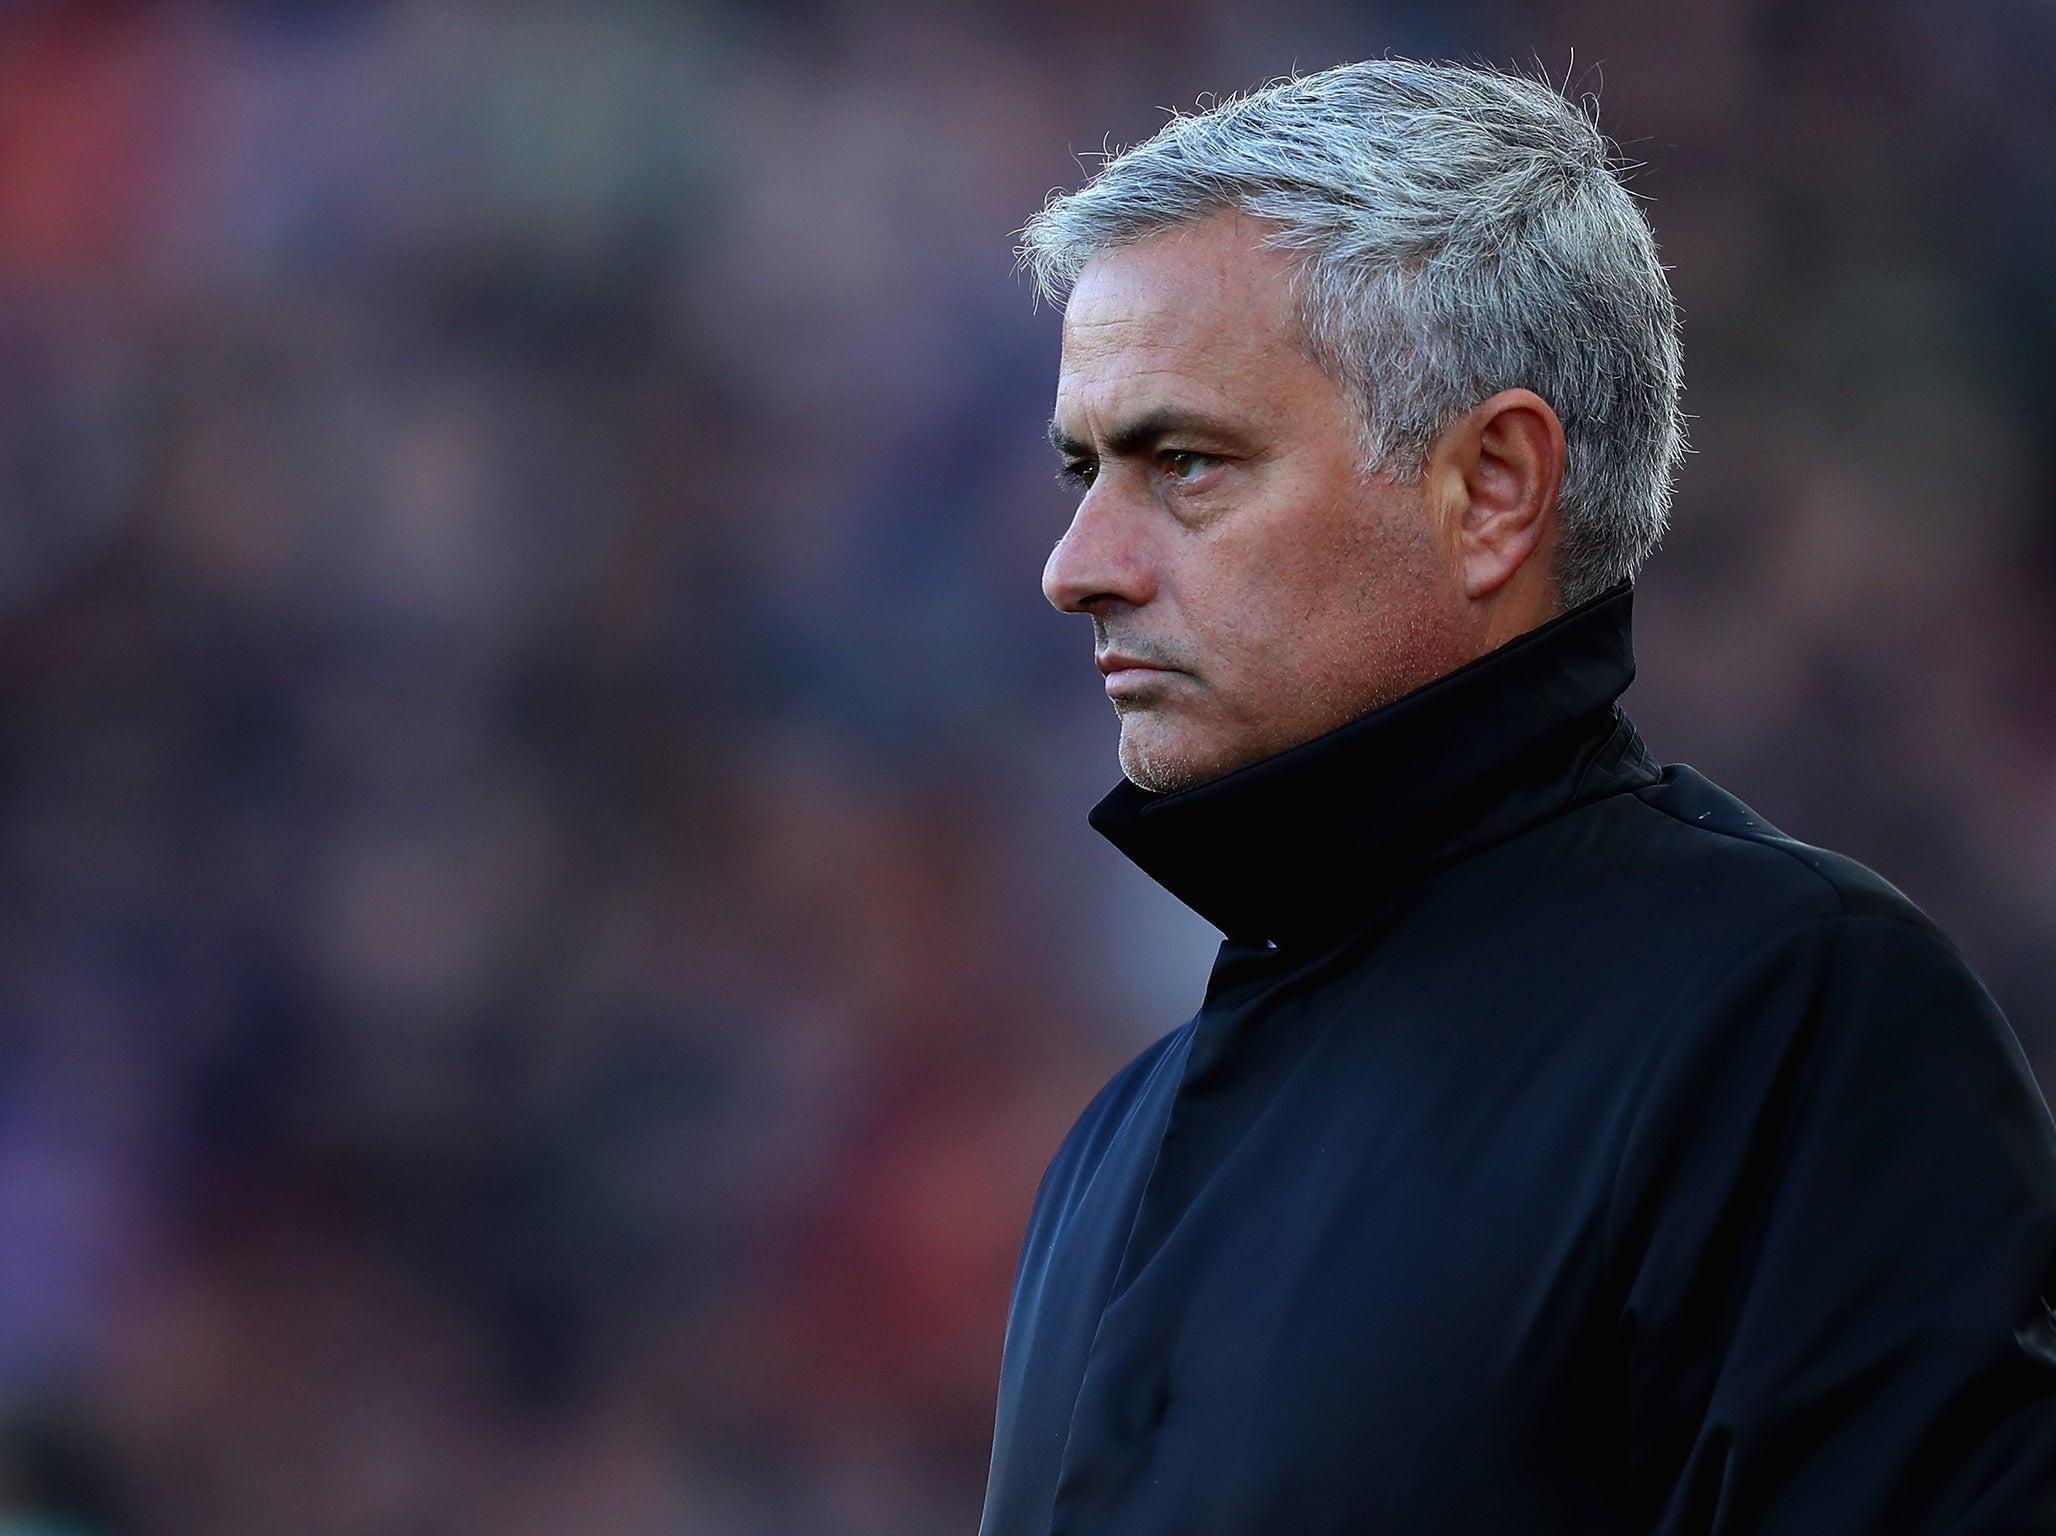 manchester united manager jose mourinho claims english